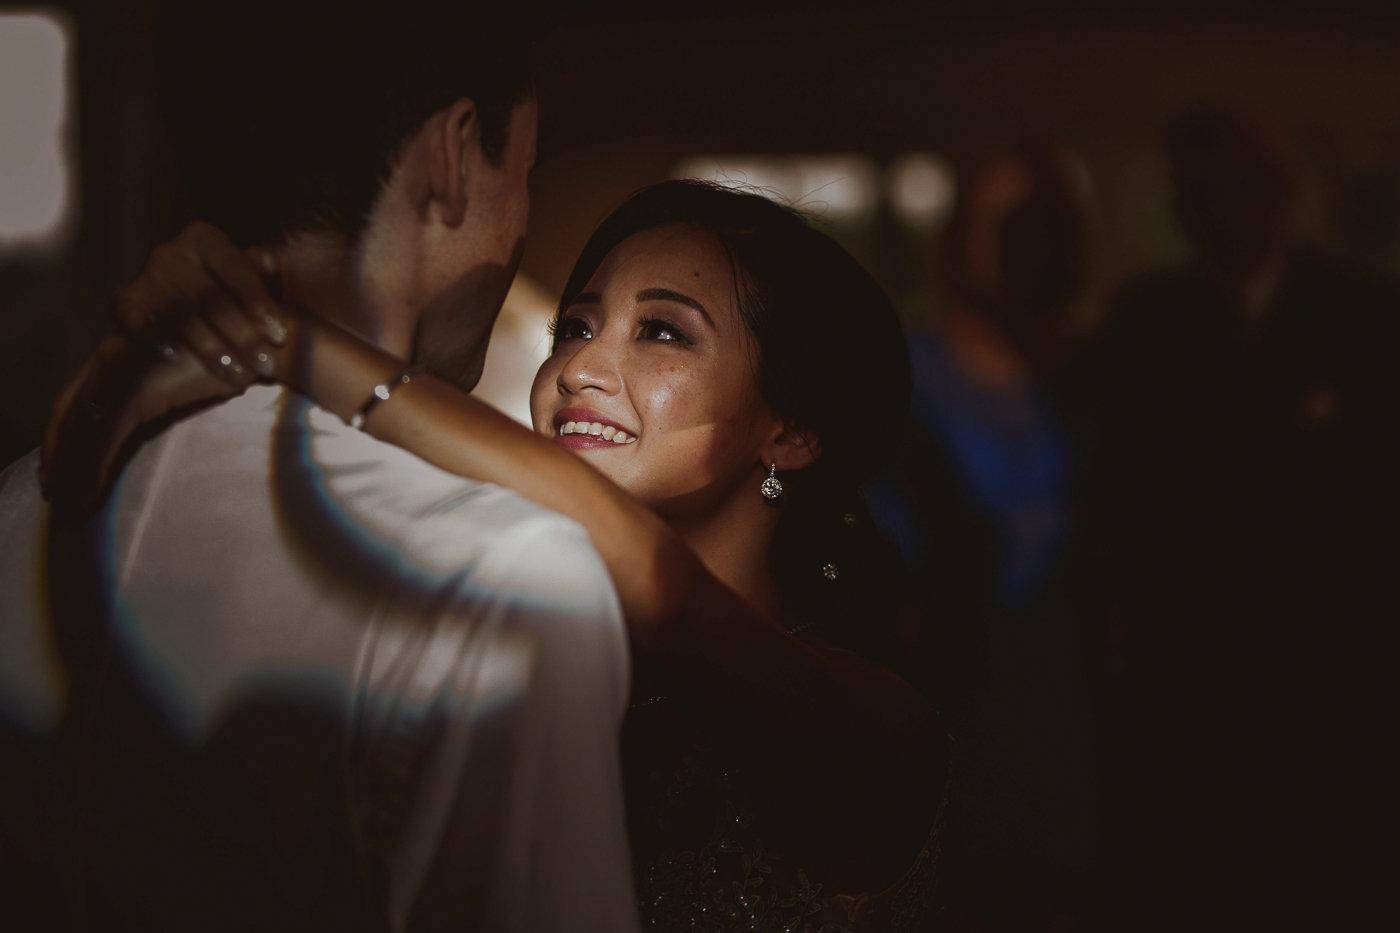 froyle-park-wedding-photography-46.jpg